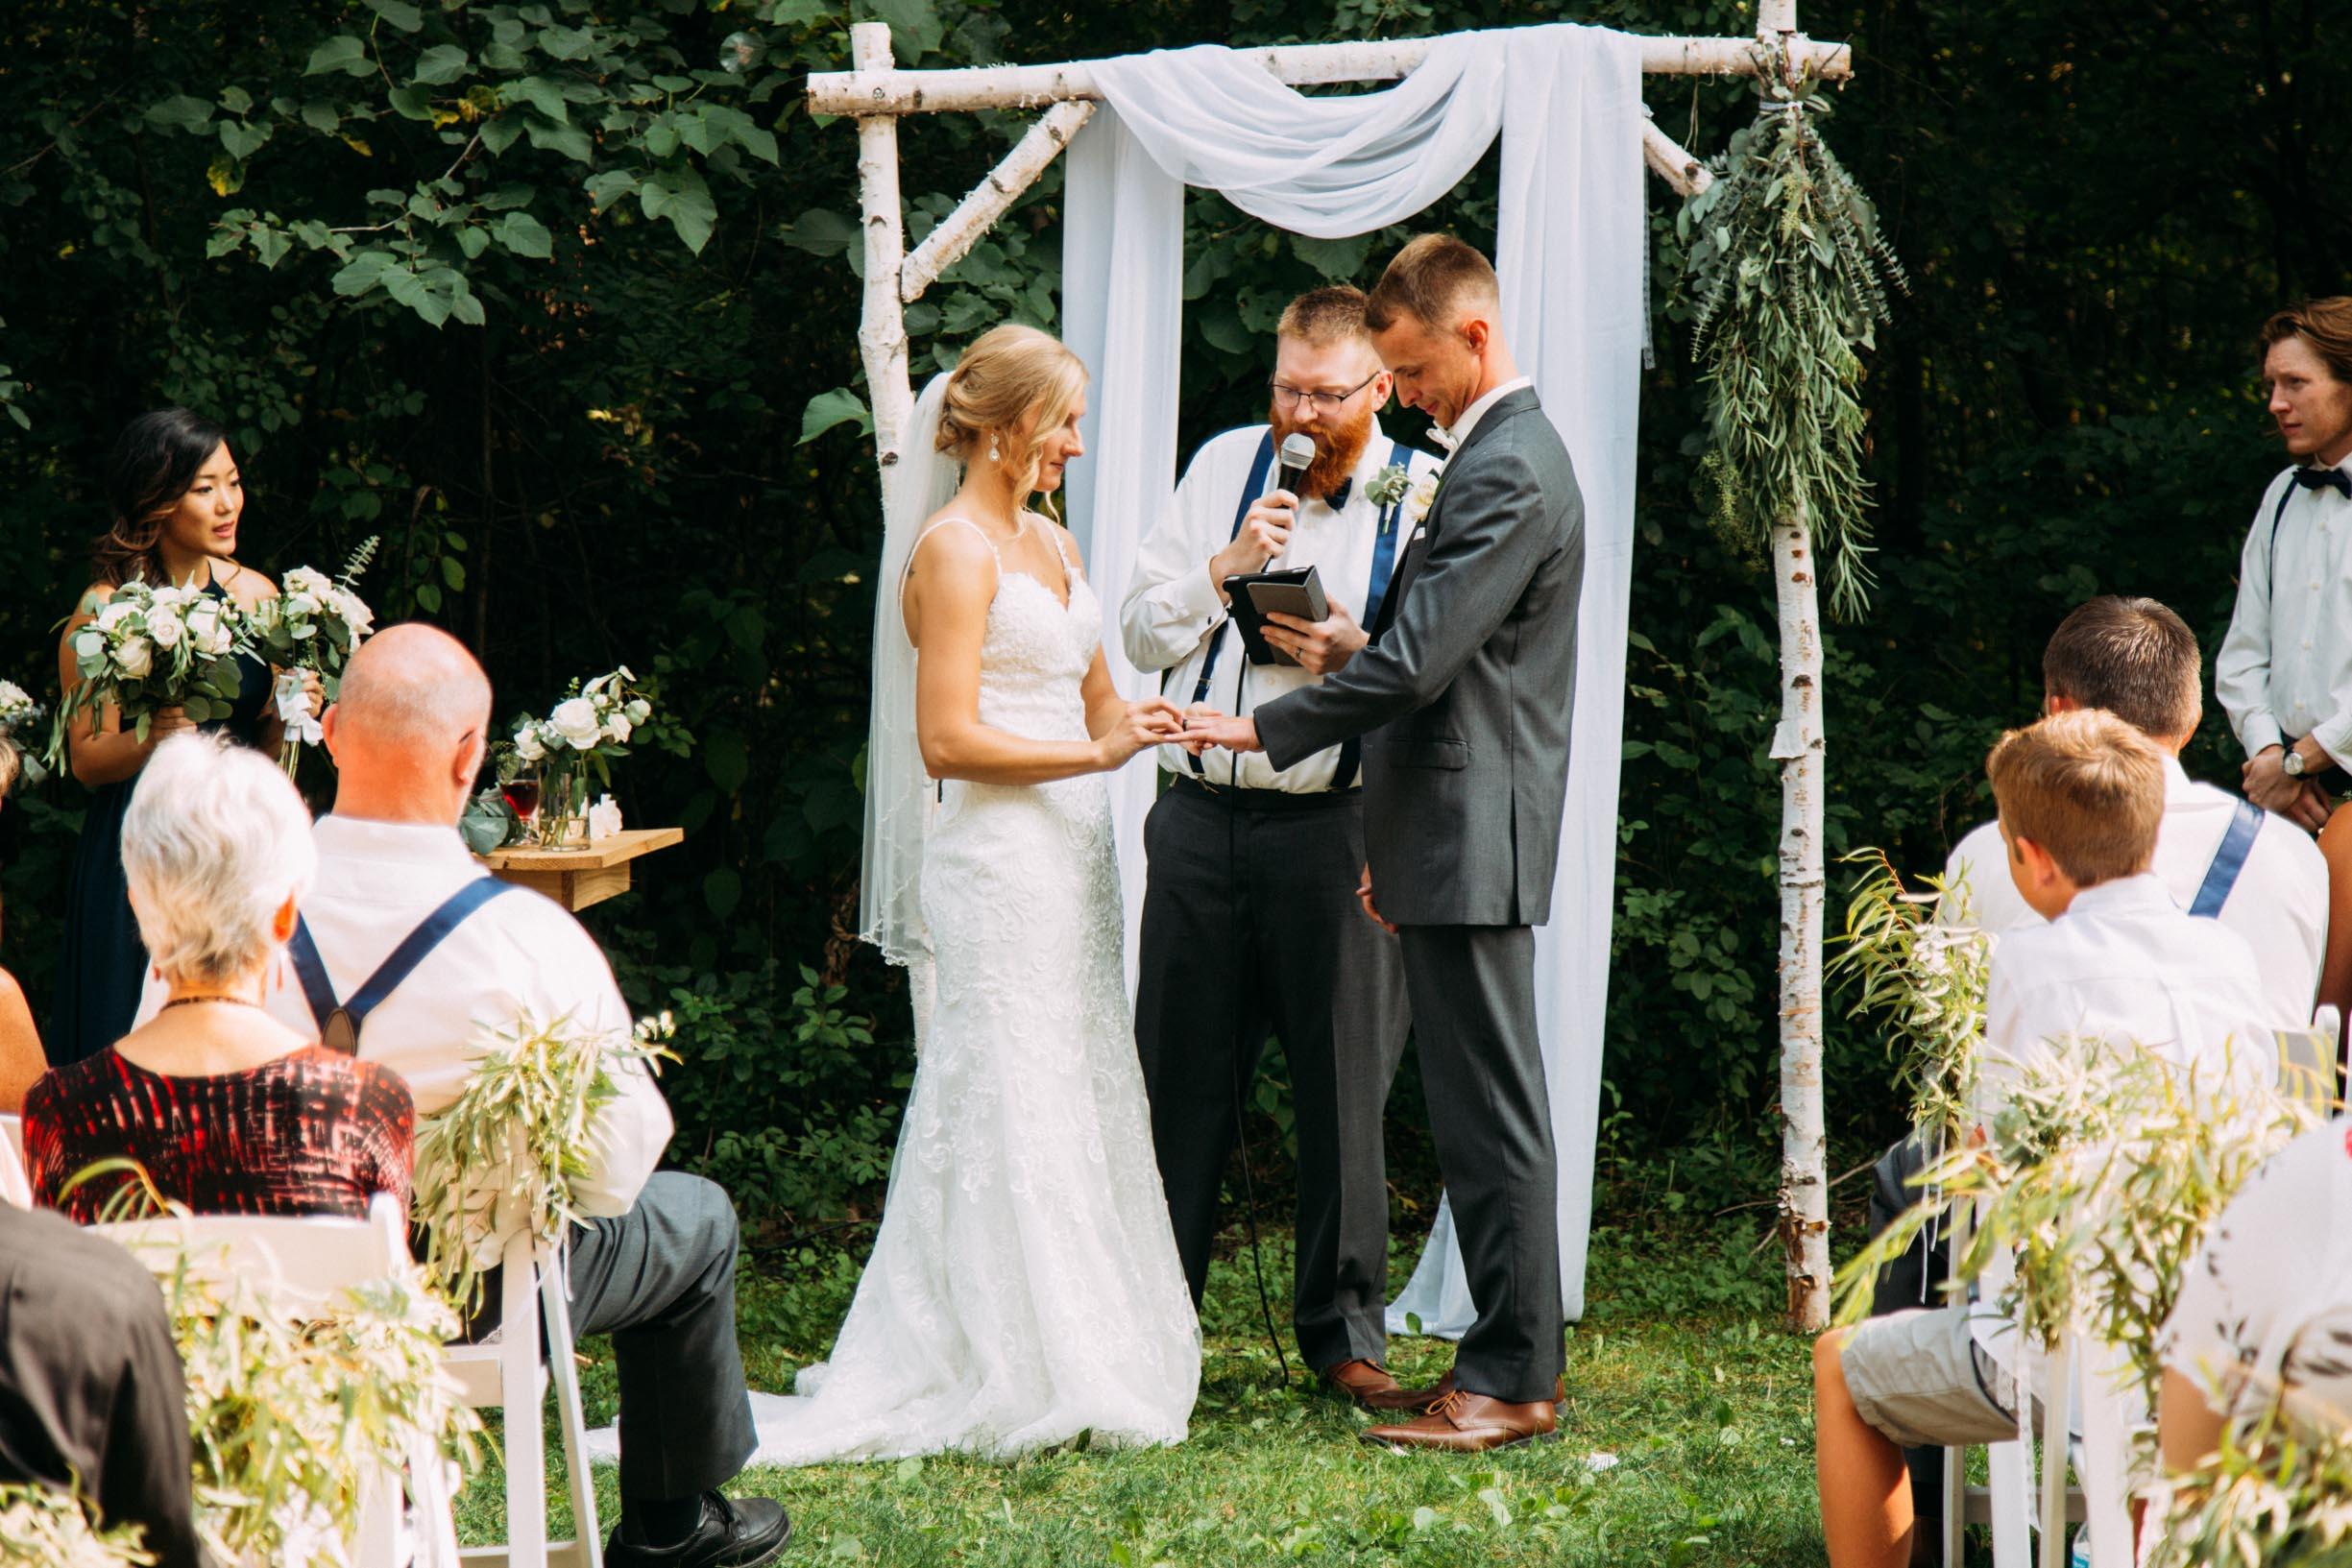 23-Minnetonka Orchards Wedding Ashley Bryce Blog.jpg